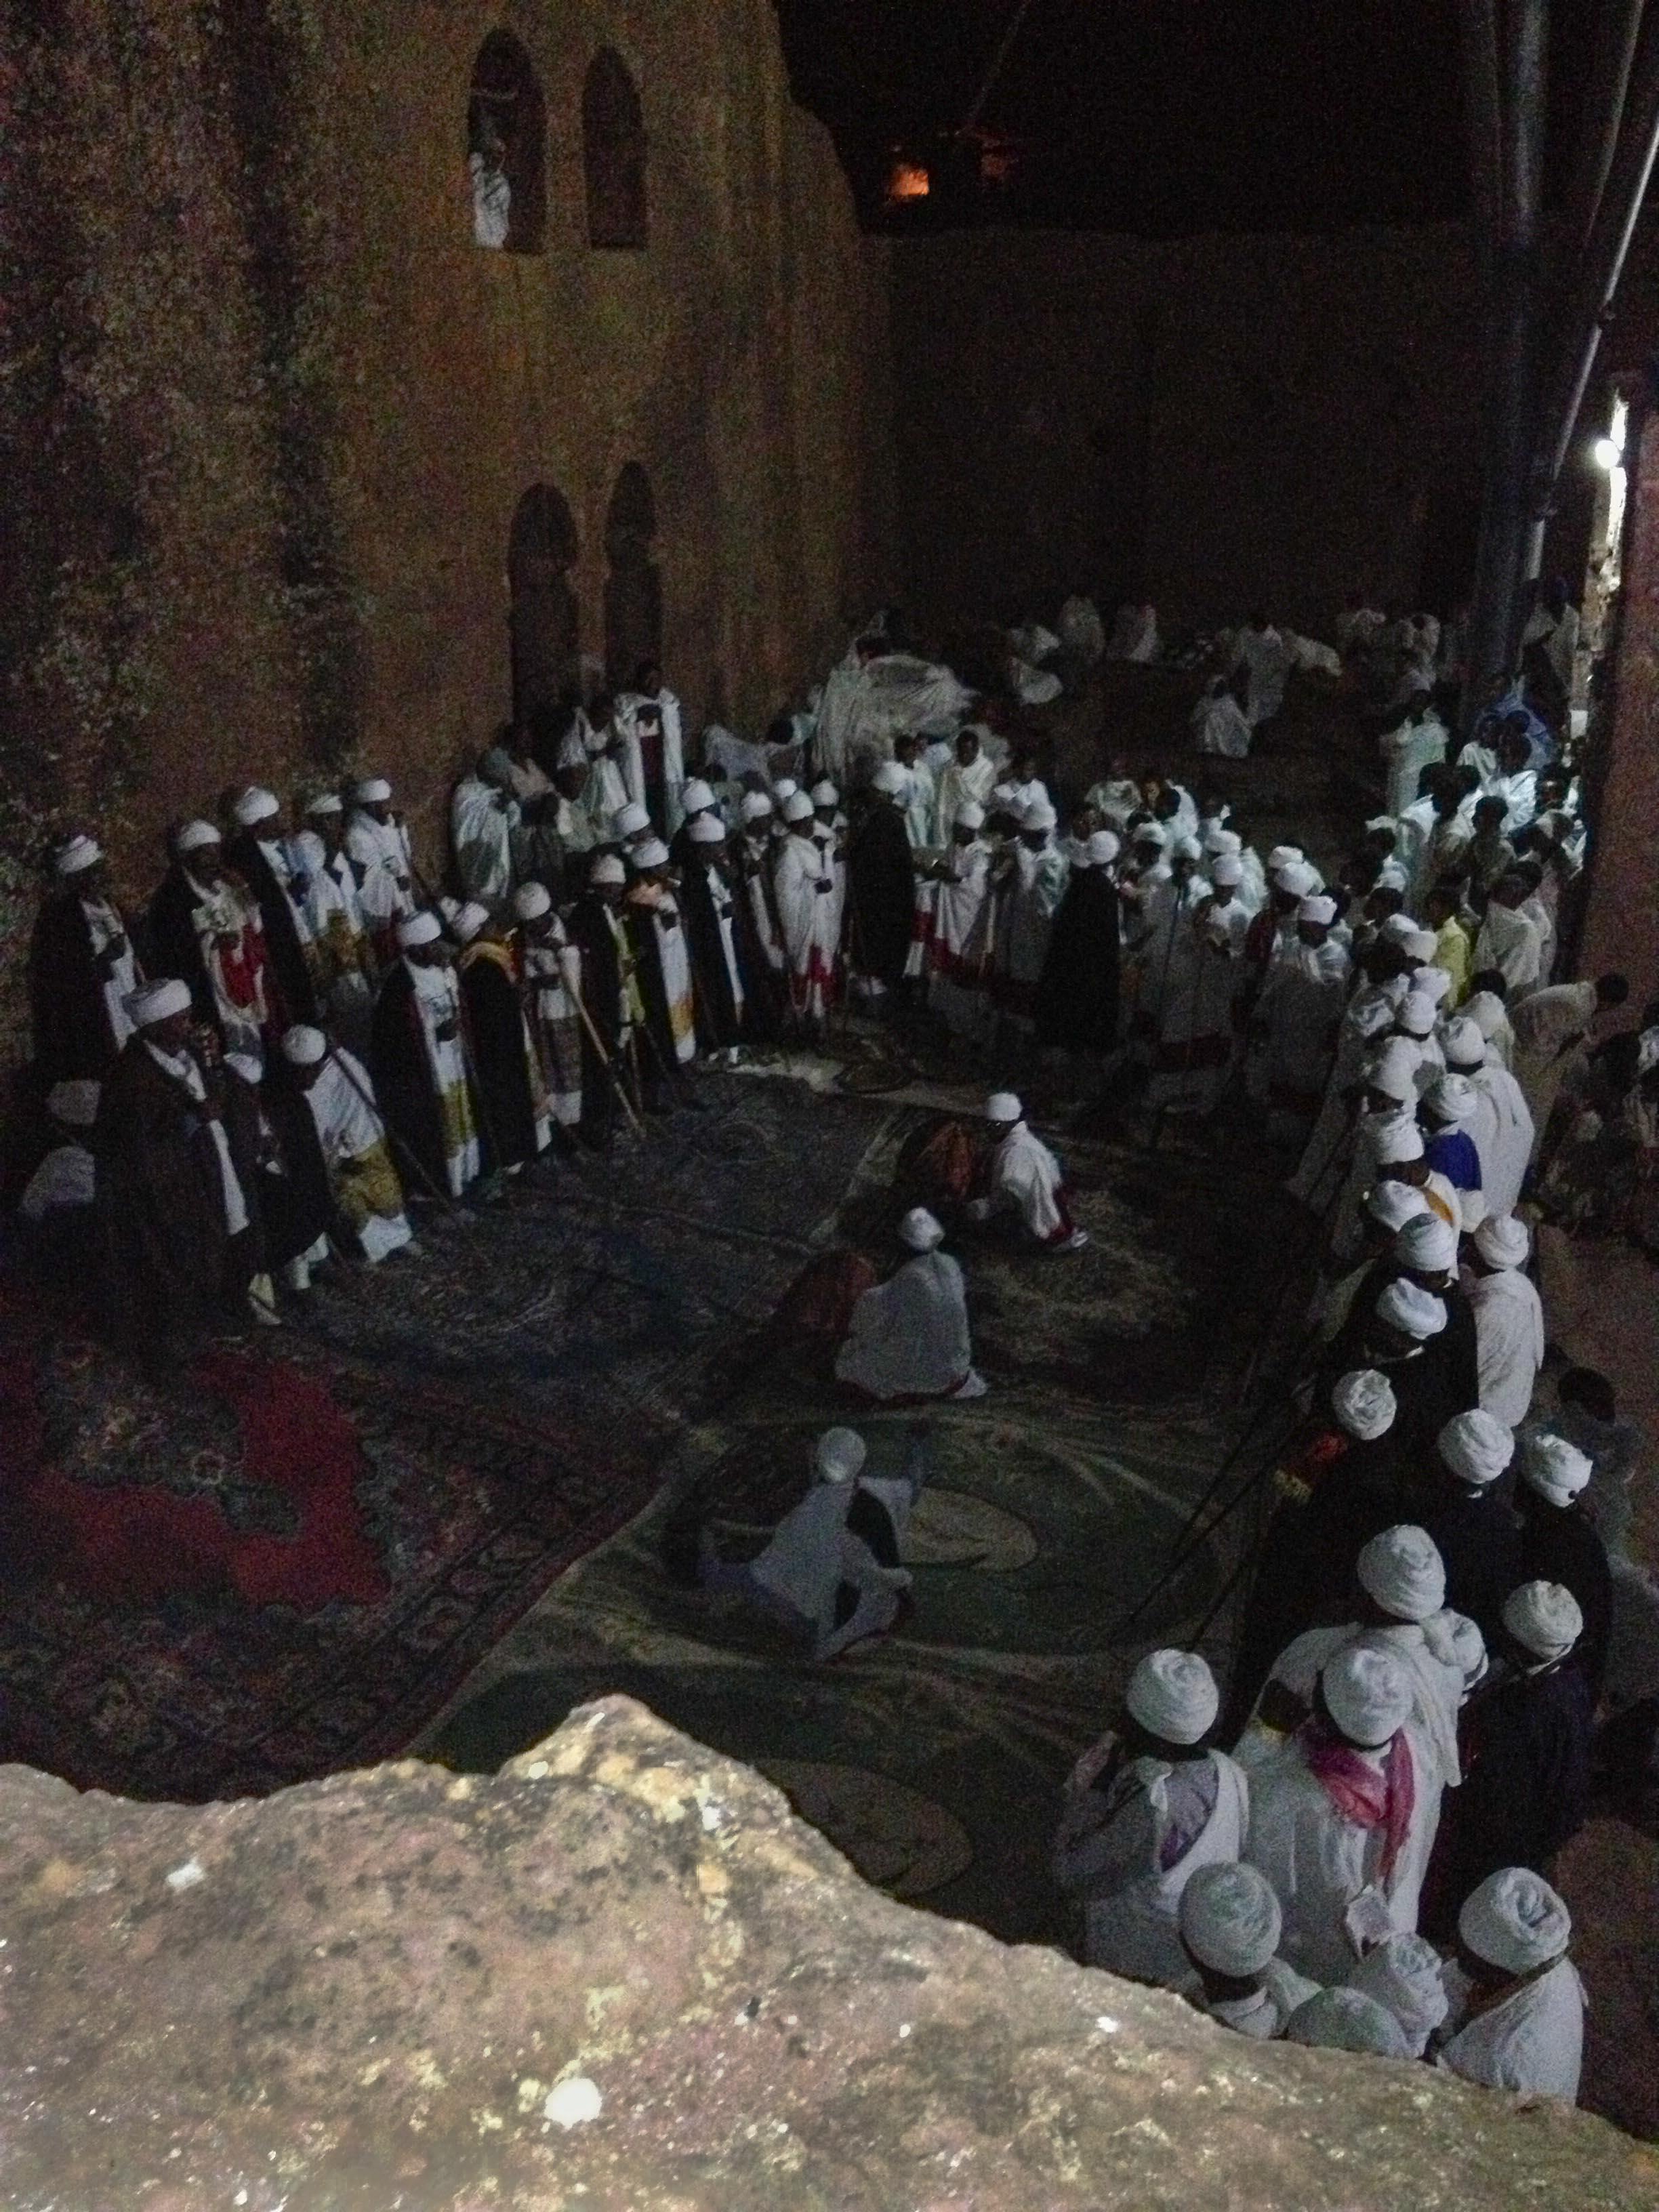 lalibella-mary-celebration-church-ethiopia-10-13-2012